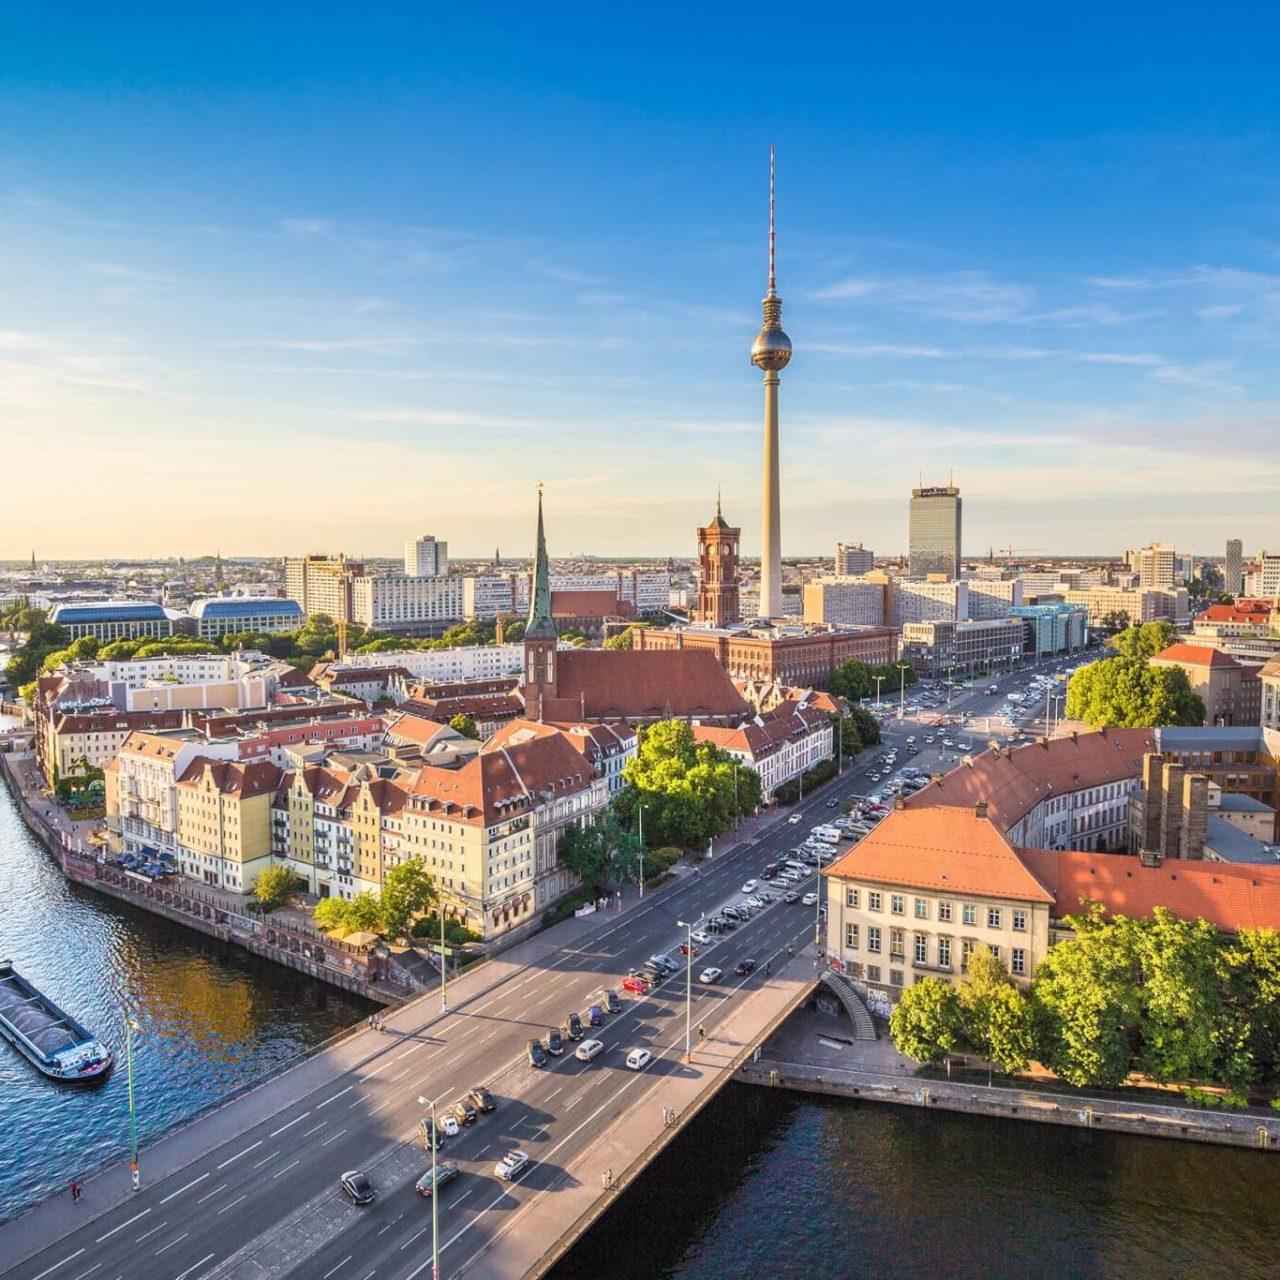 https://travelicious.bold-themes.com/main-demo/wp-content/uploads/sites/2/2018/09/destination-berlin-05-1280x1280.jpg